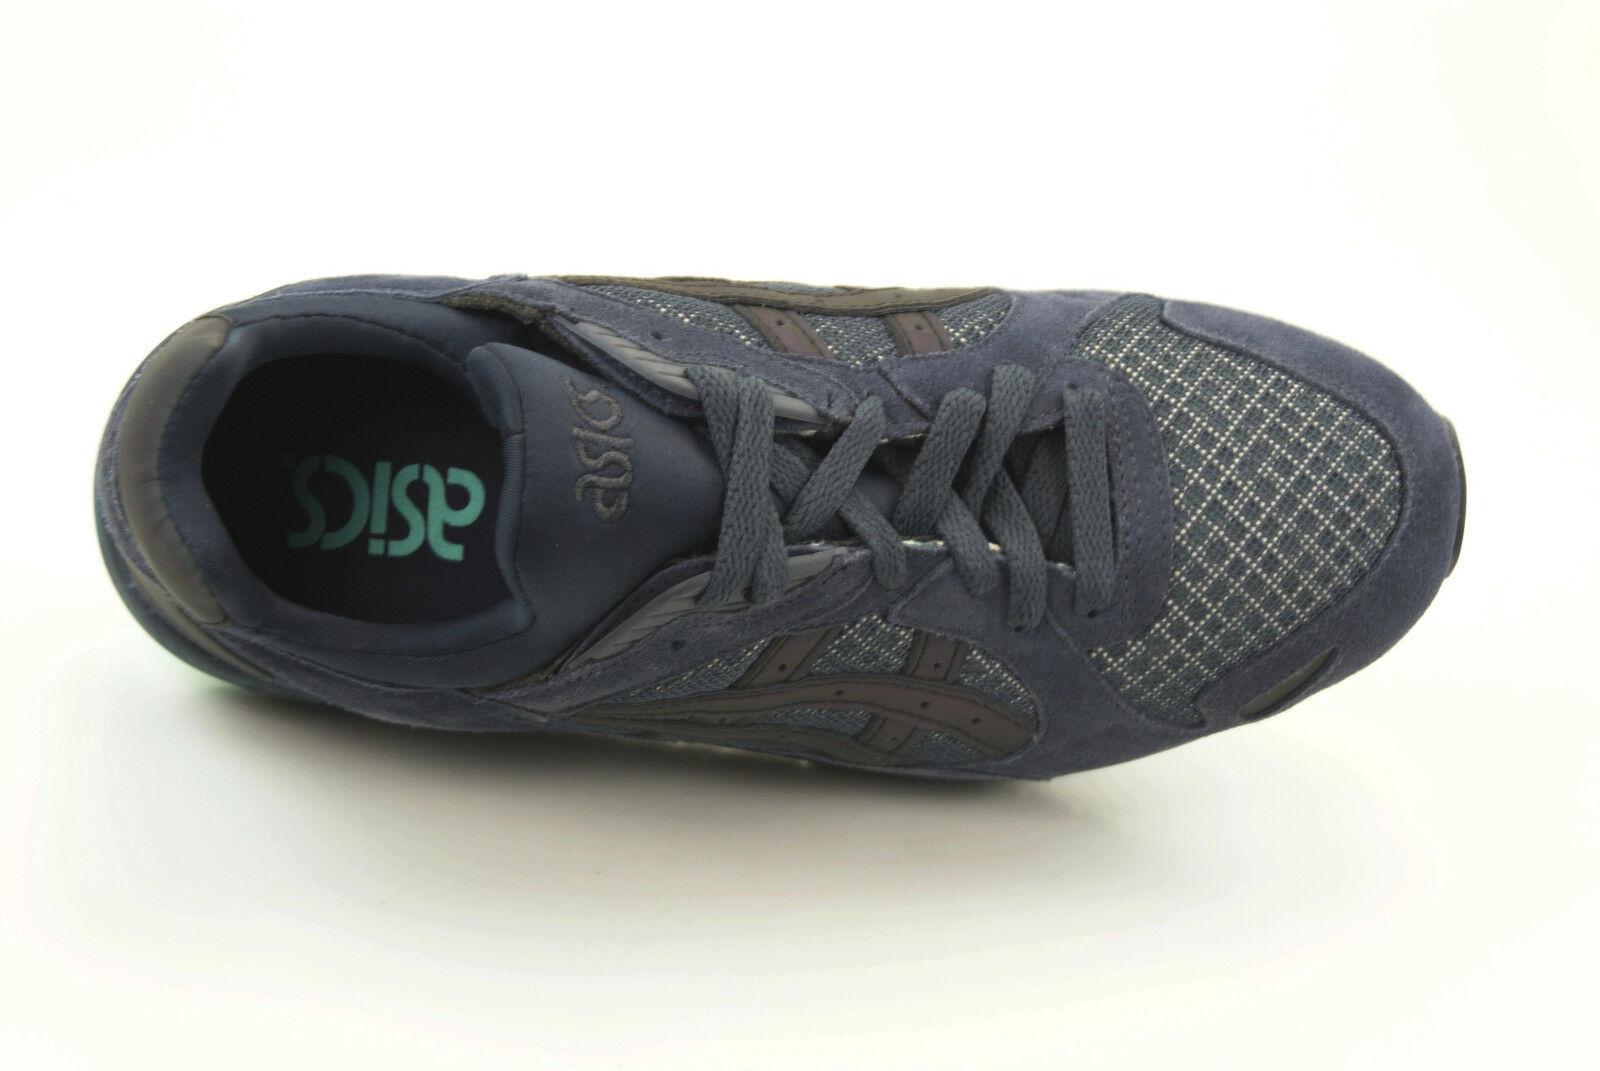 Asics GT-Cool Xpress Sneakers Turnschuhe Sportschuhe Sneakers Xpress Herren Schuhe H6Y2L-5050 f452a2